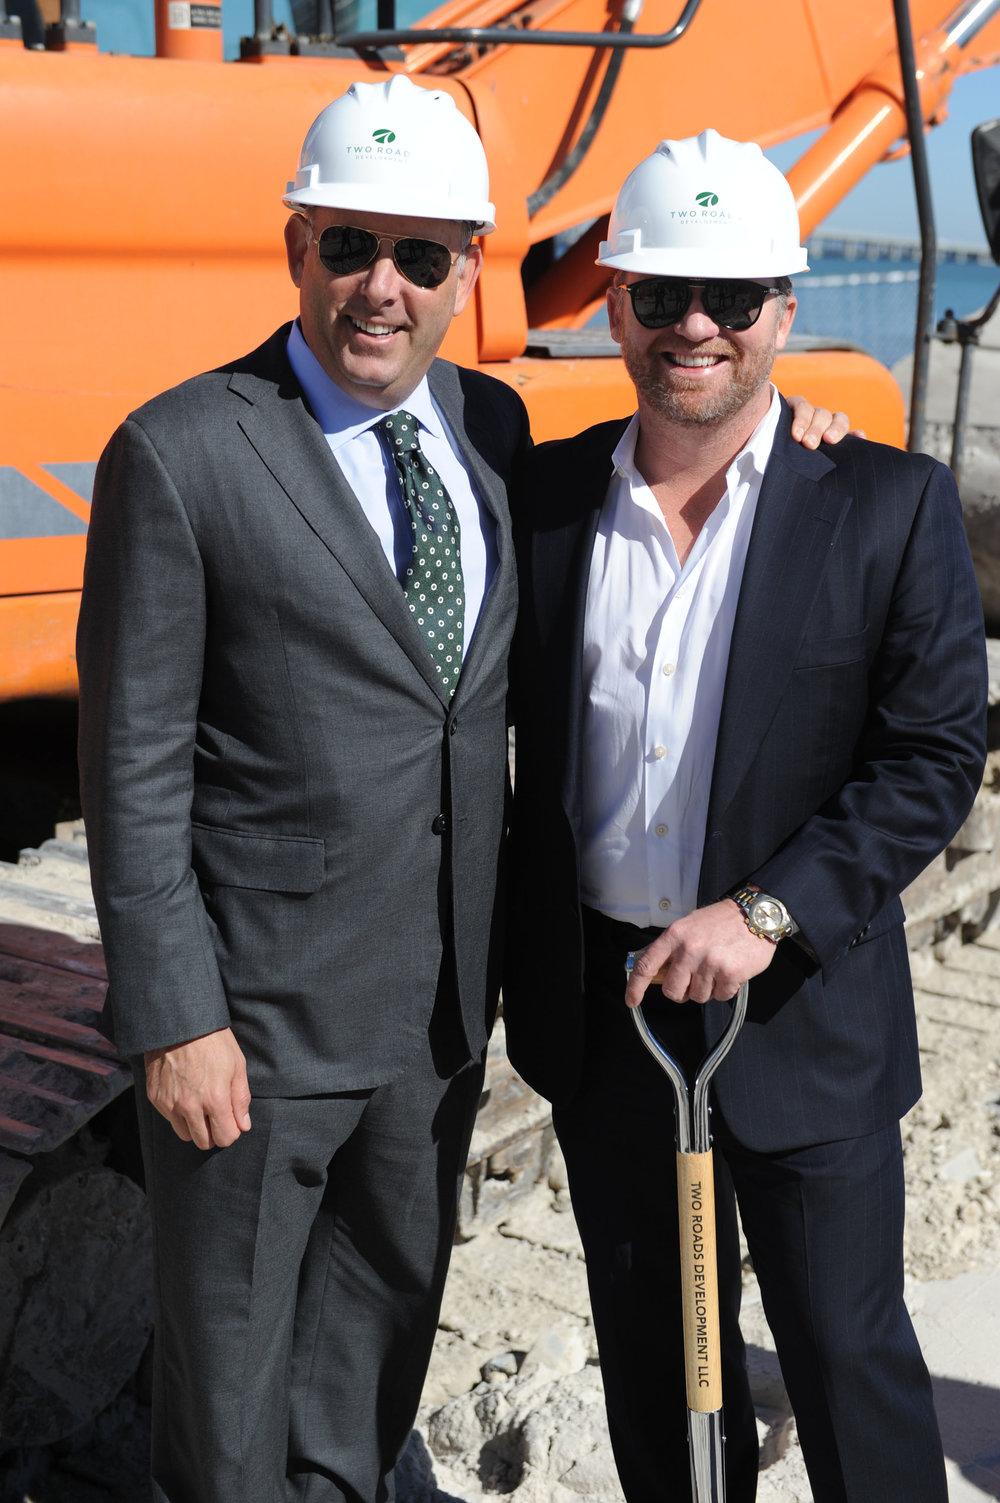 Reid Boren & Taylor Collins of Two Roads Development